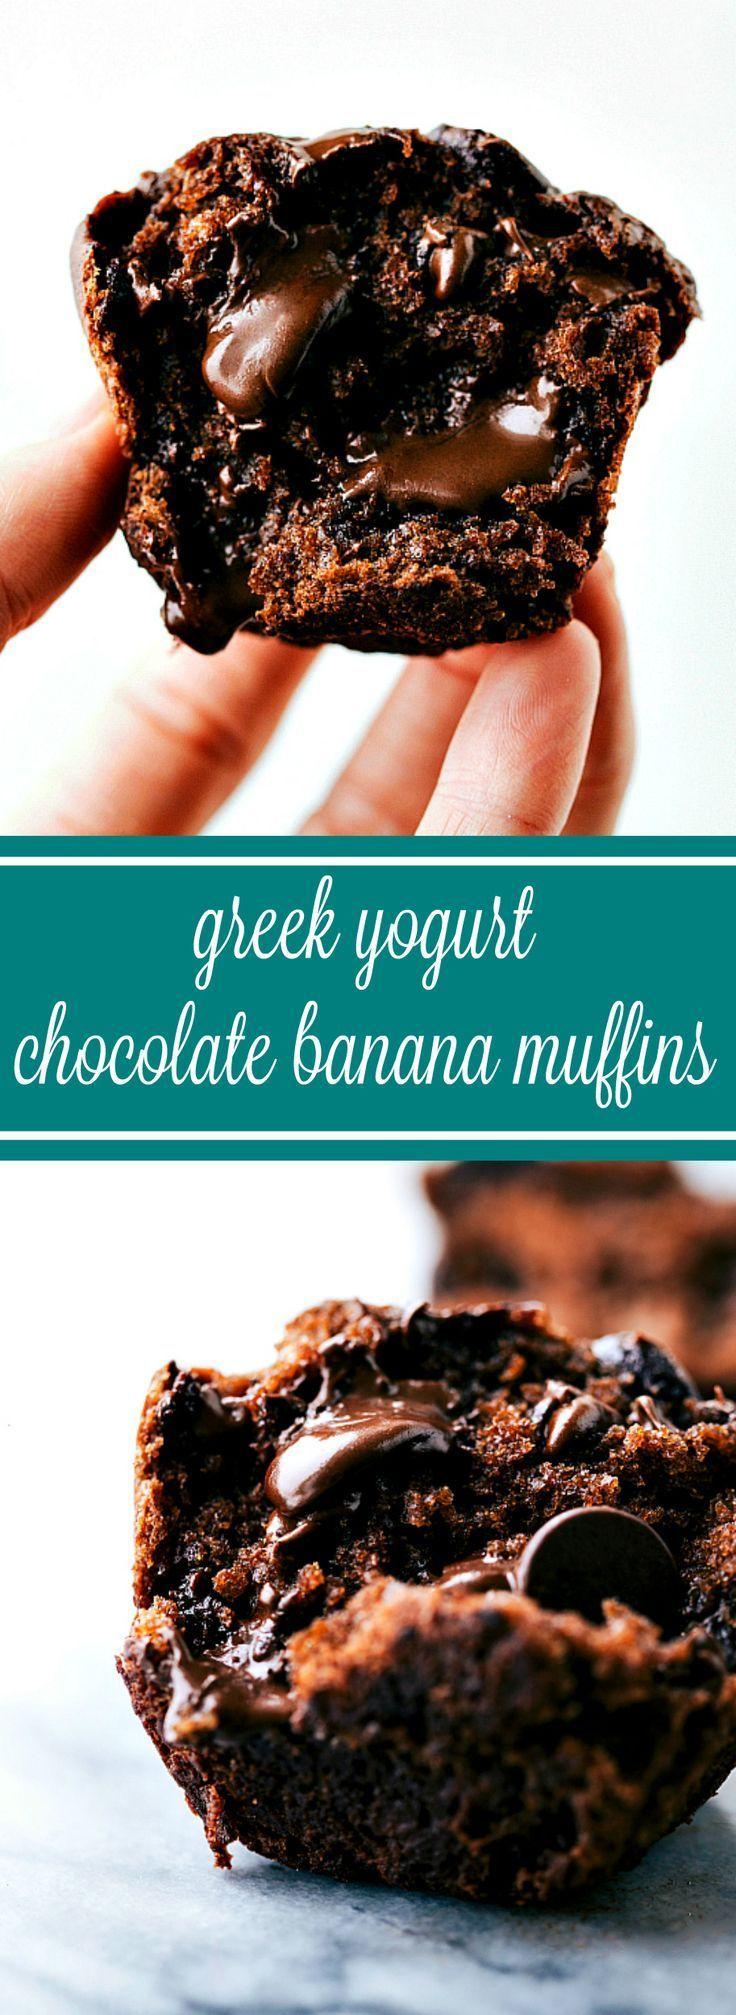 Delicious Bakery Style Greek Yogurt Chocolate Banana Muffins | healthy recipe ideas /xhealthyrecipex/ |